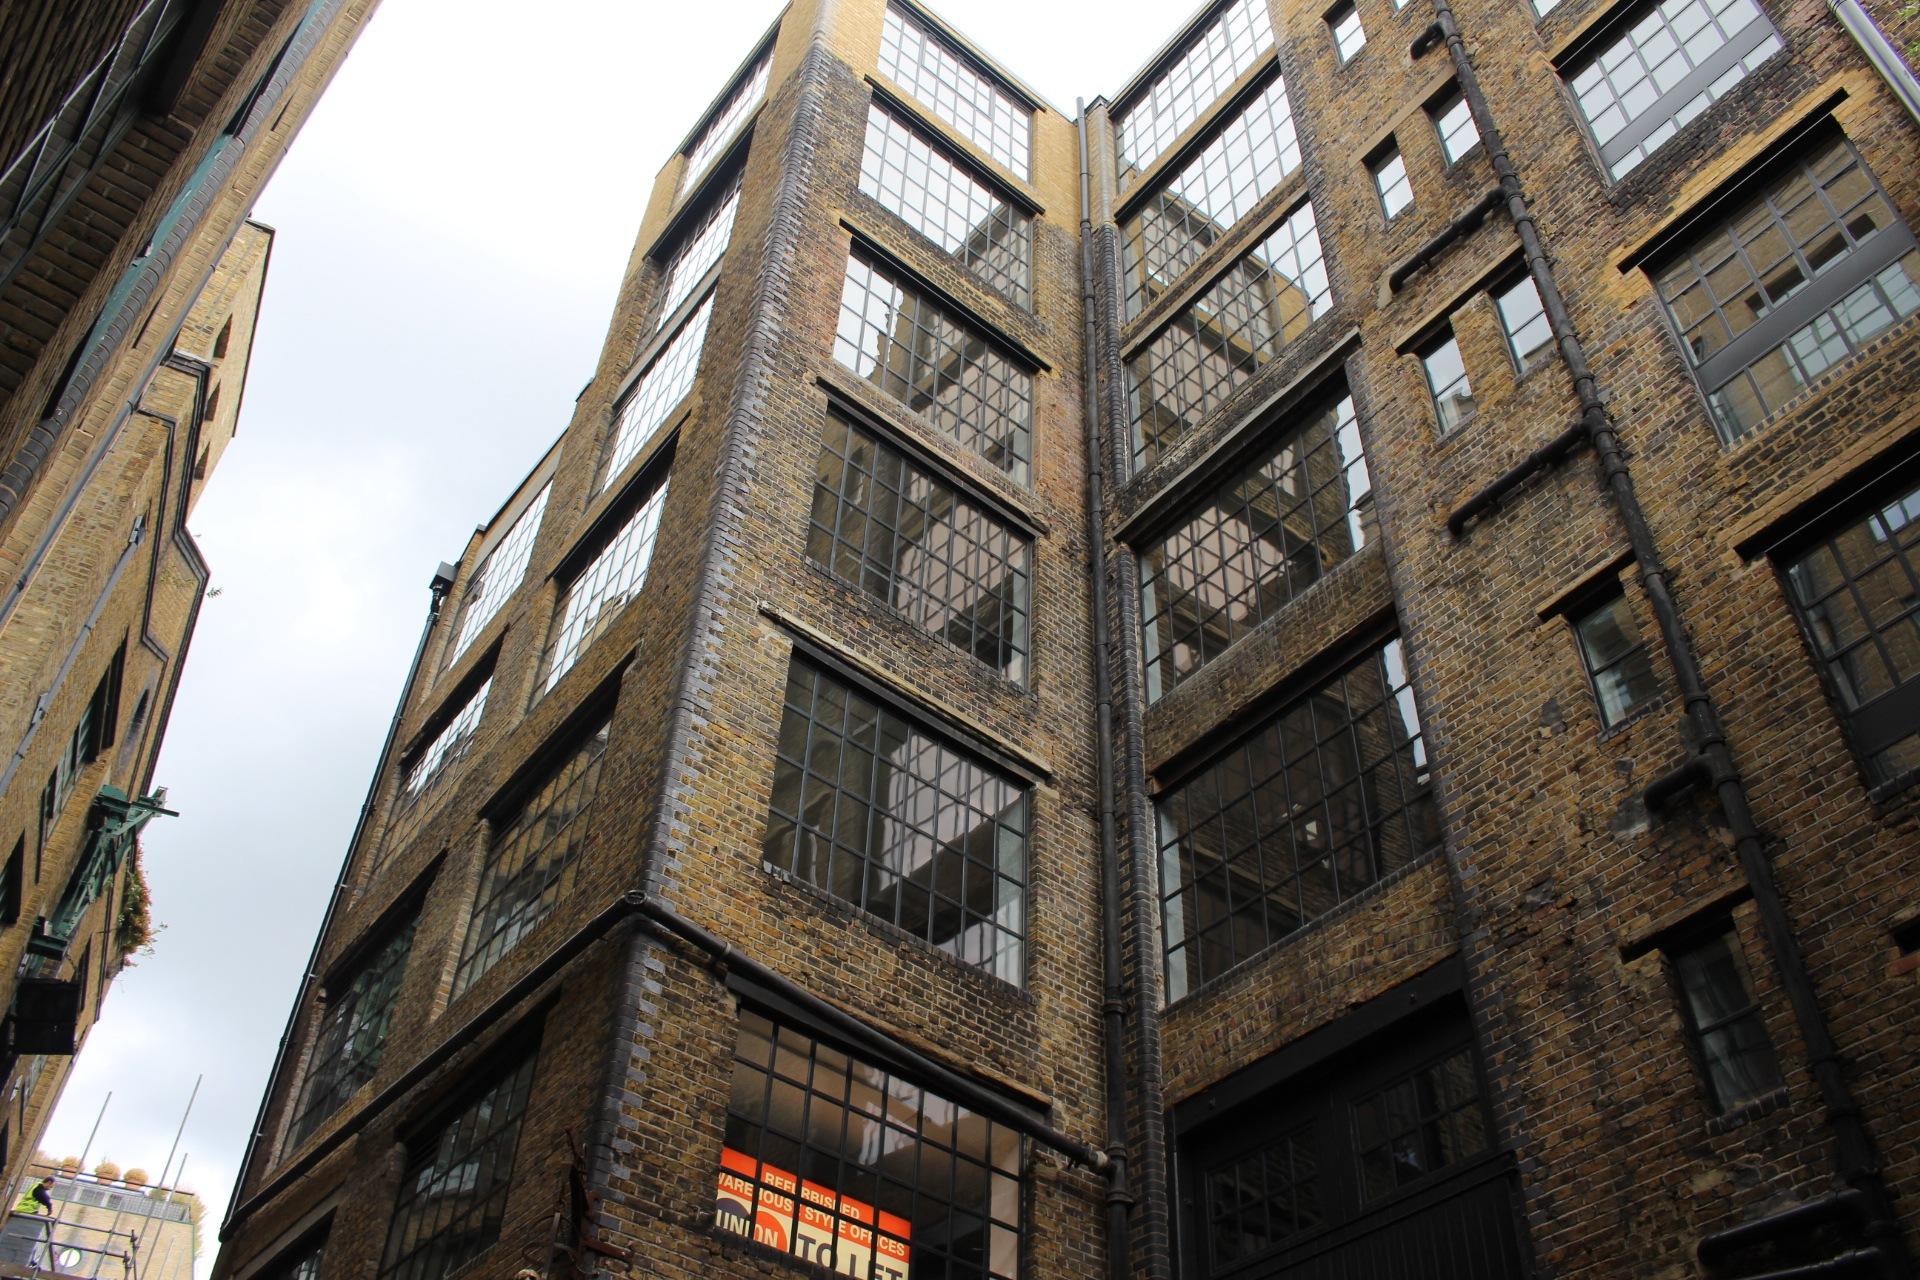 London Architecture PT.3 by LensCreative